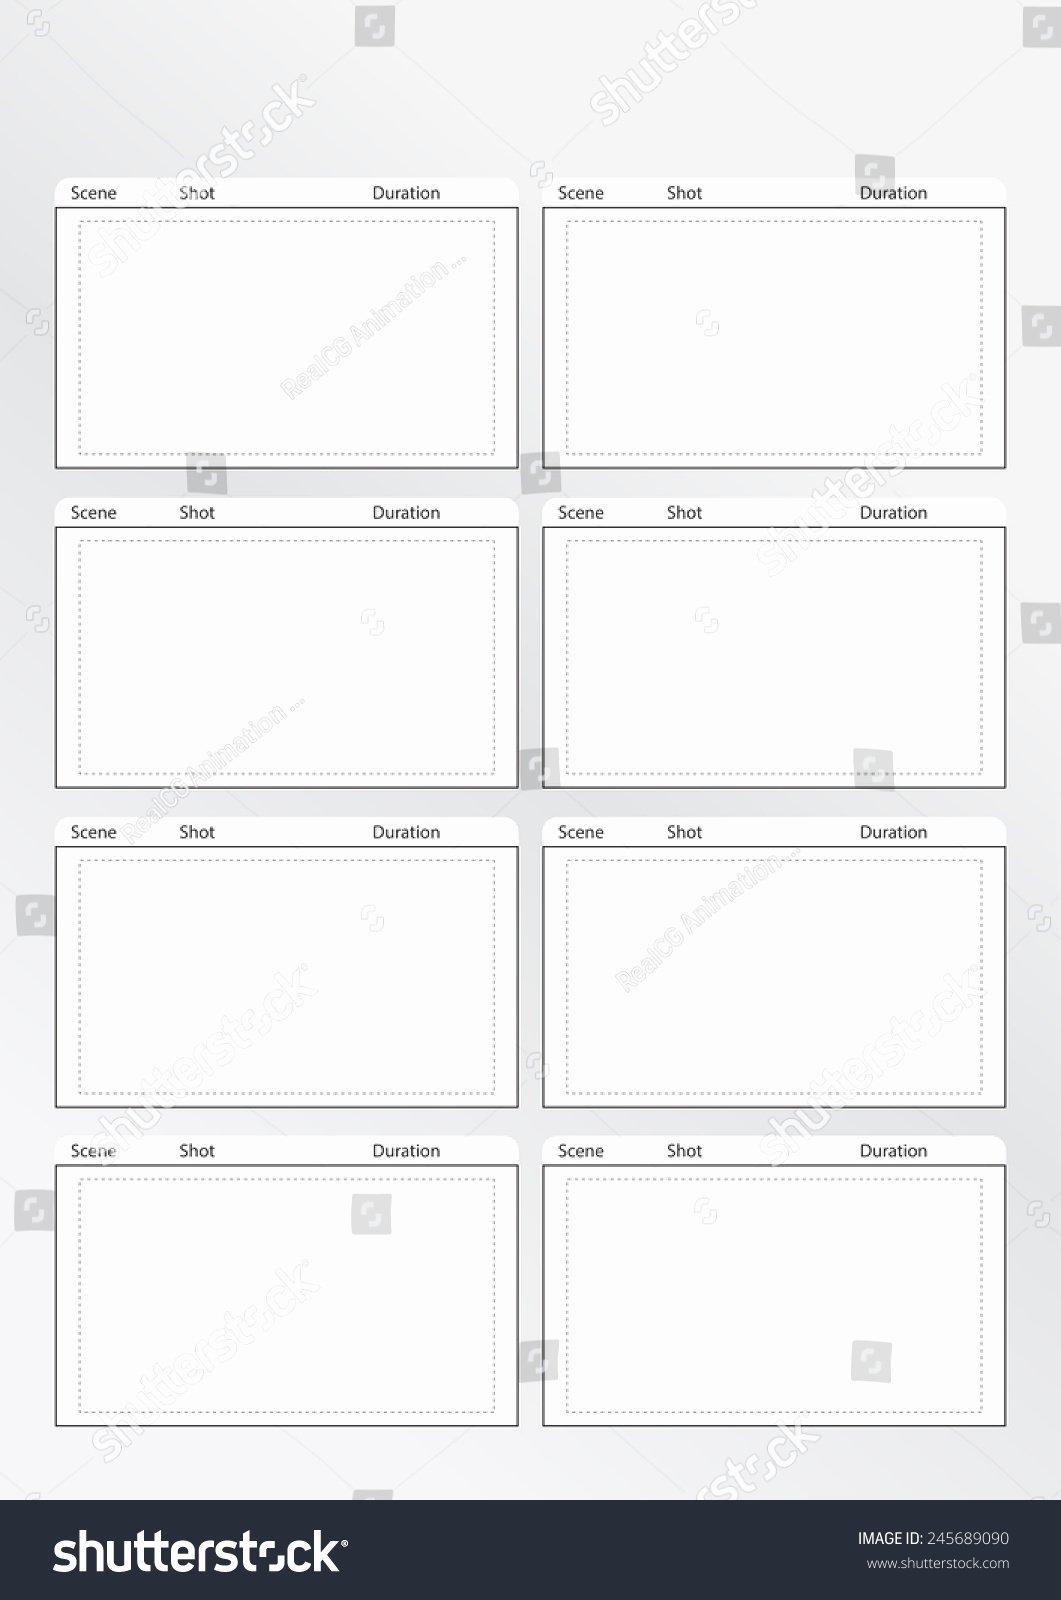 Professional Film Storyboard Template Luxury Professional Storyboard Template for Easy to